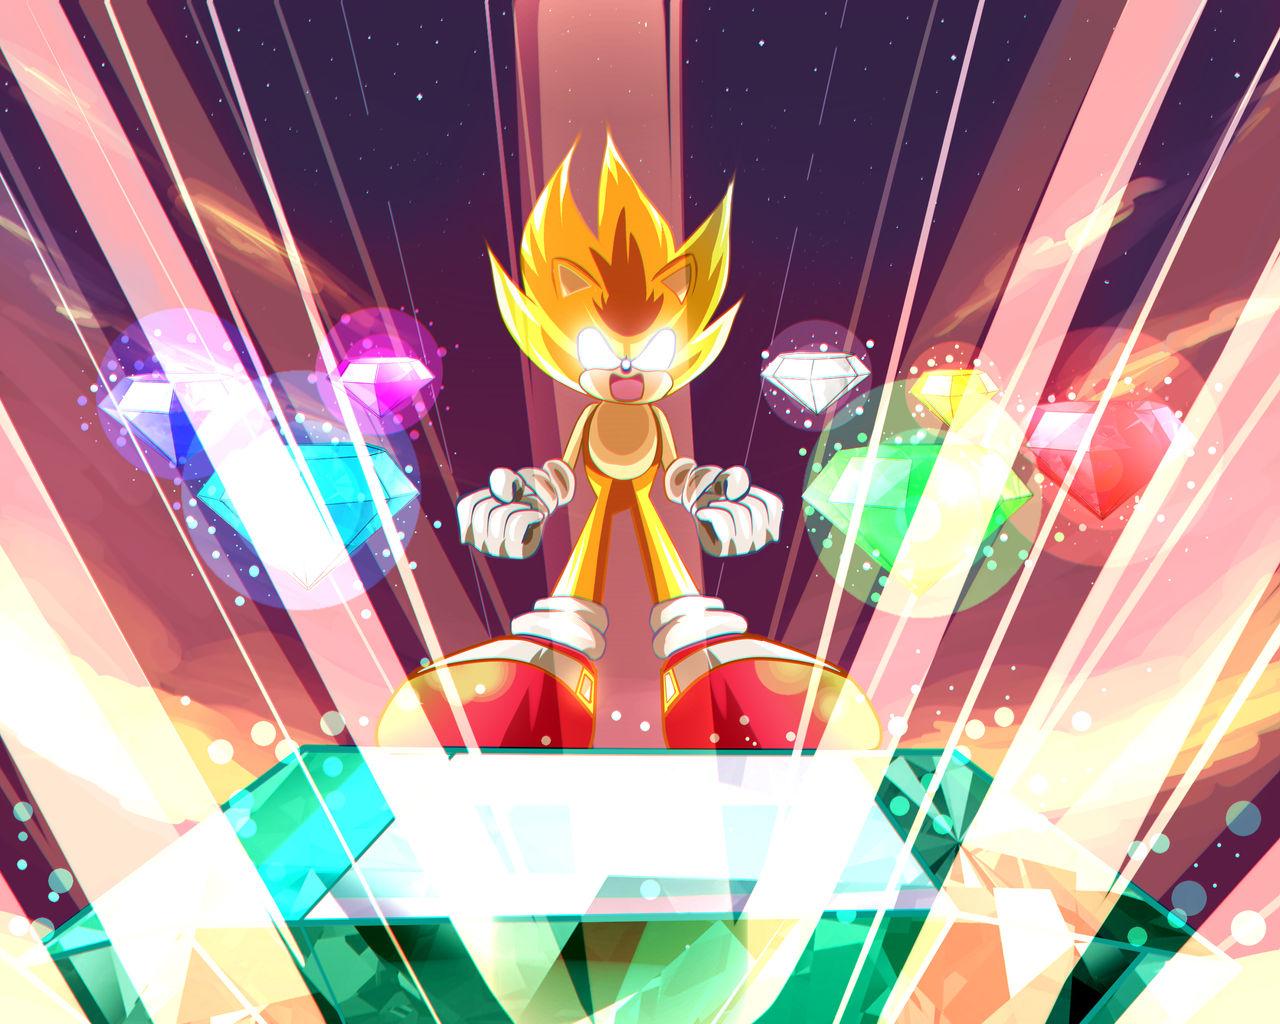 Super Sonic Fanart By Jonnisalazar On Deviantart